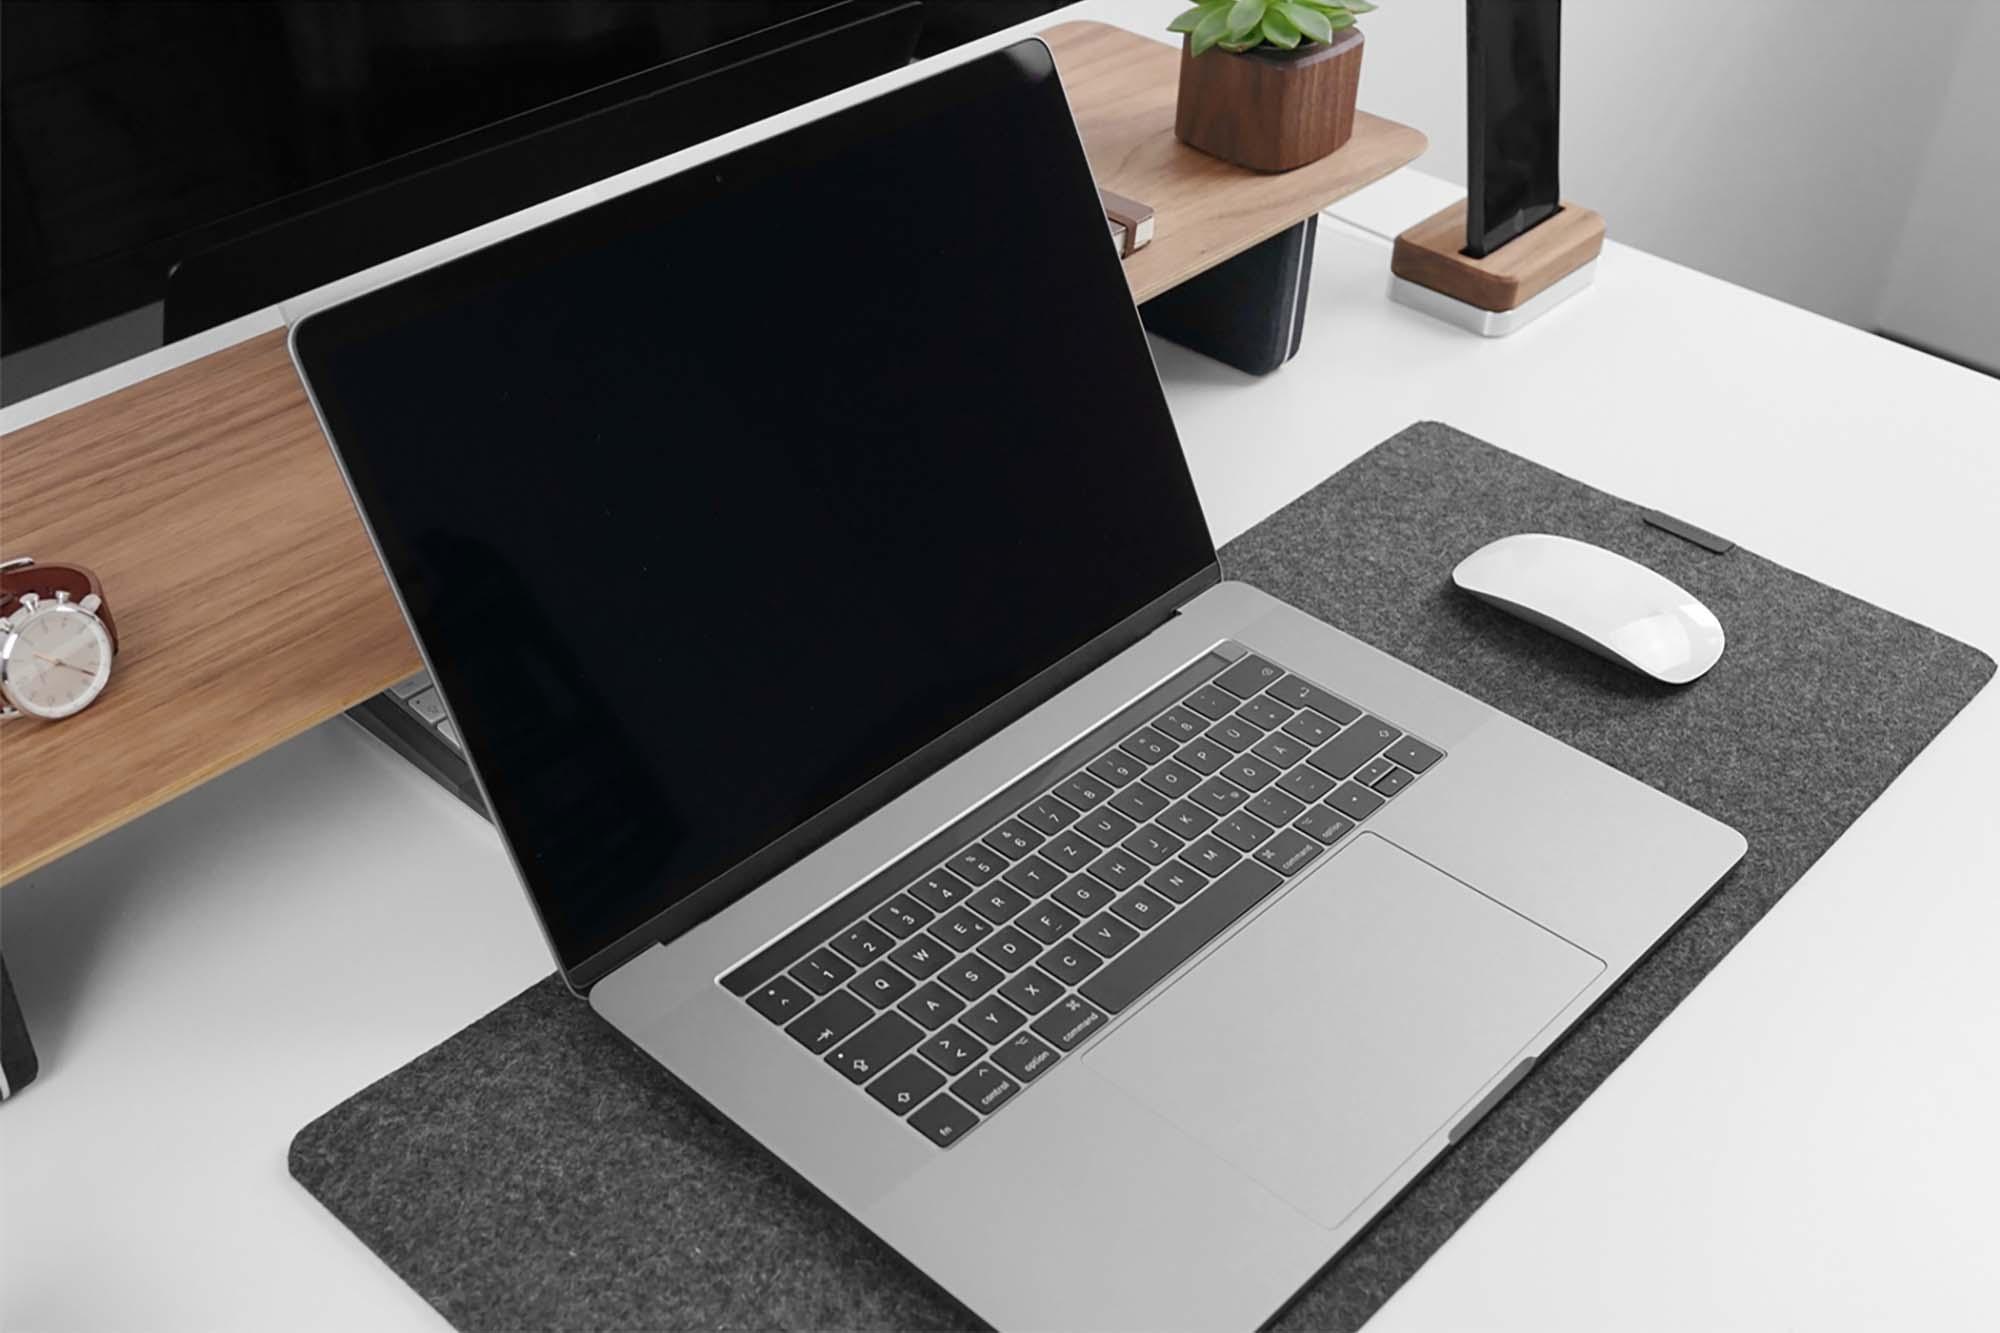 MacBook Pro 15″ Mockup 2